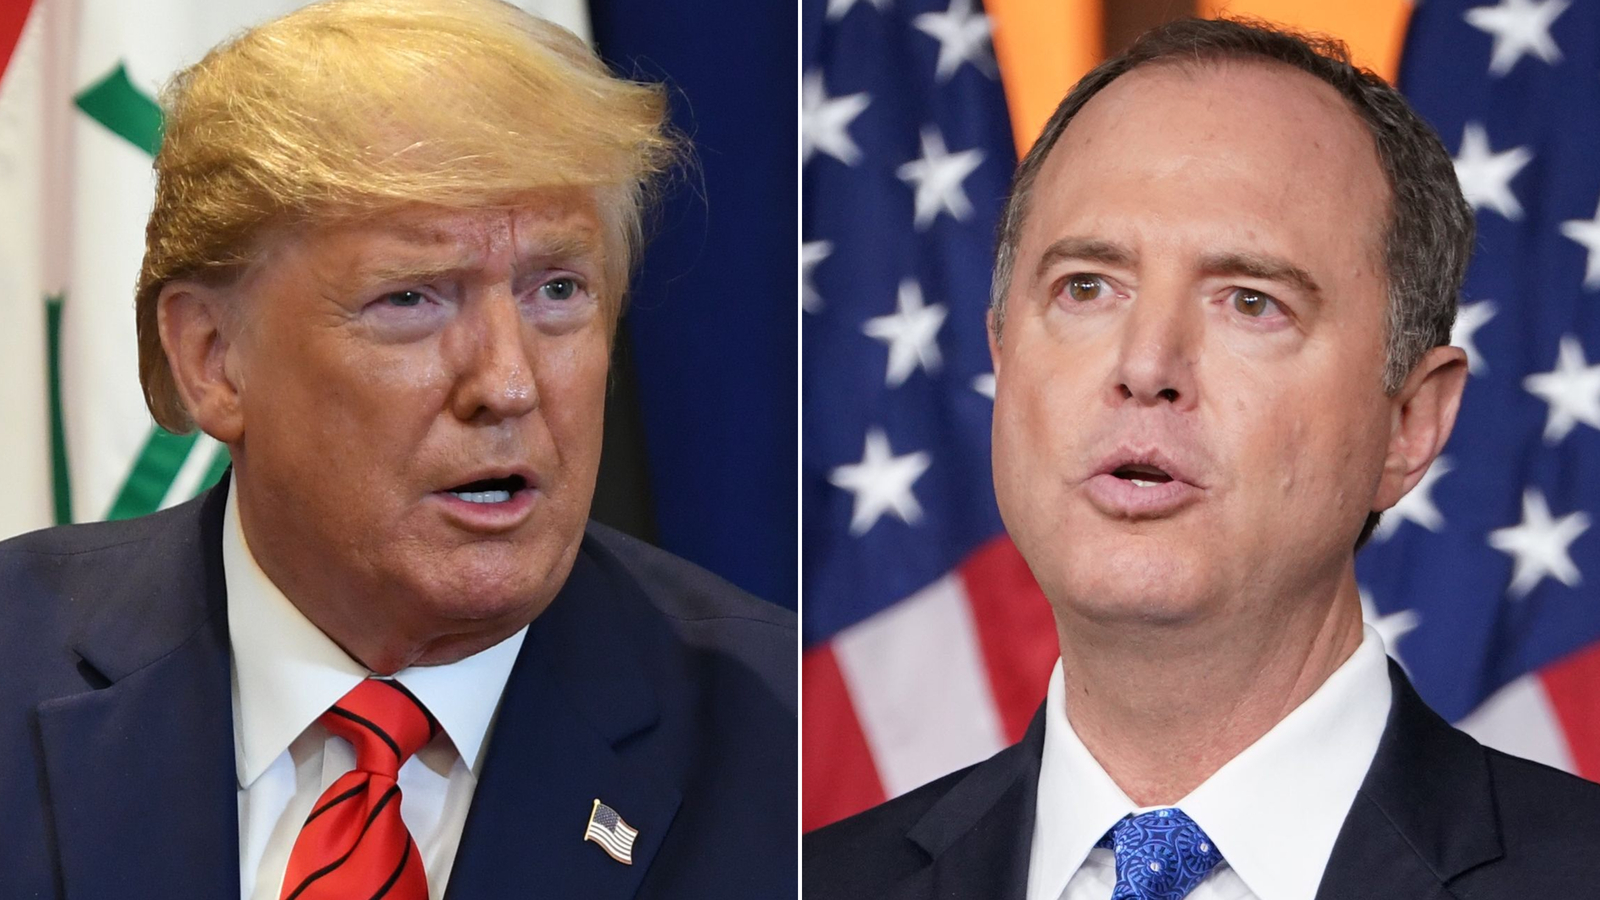 Meet The Lawmaker Leading The Trump Impeachment Inquiry Cnn Video